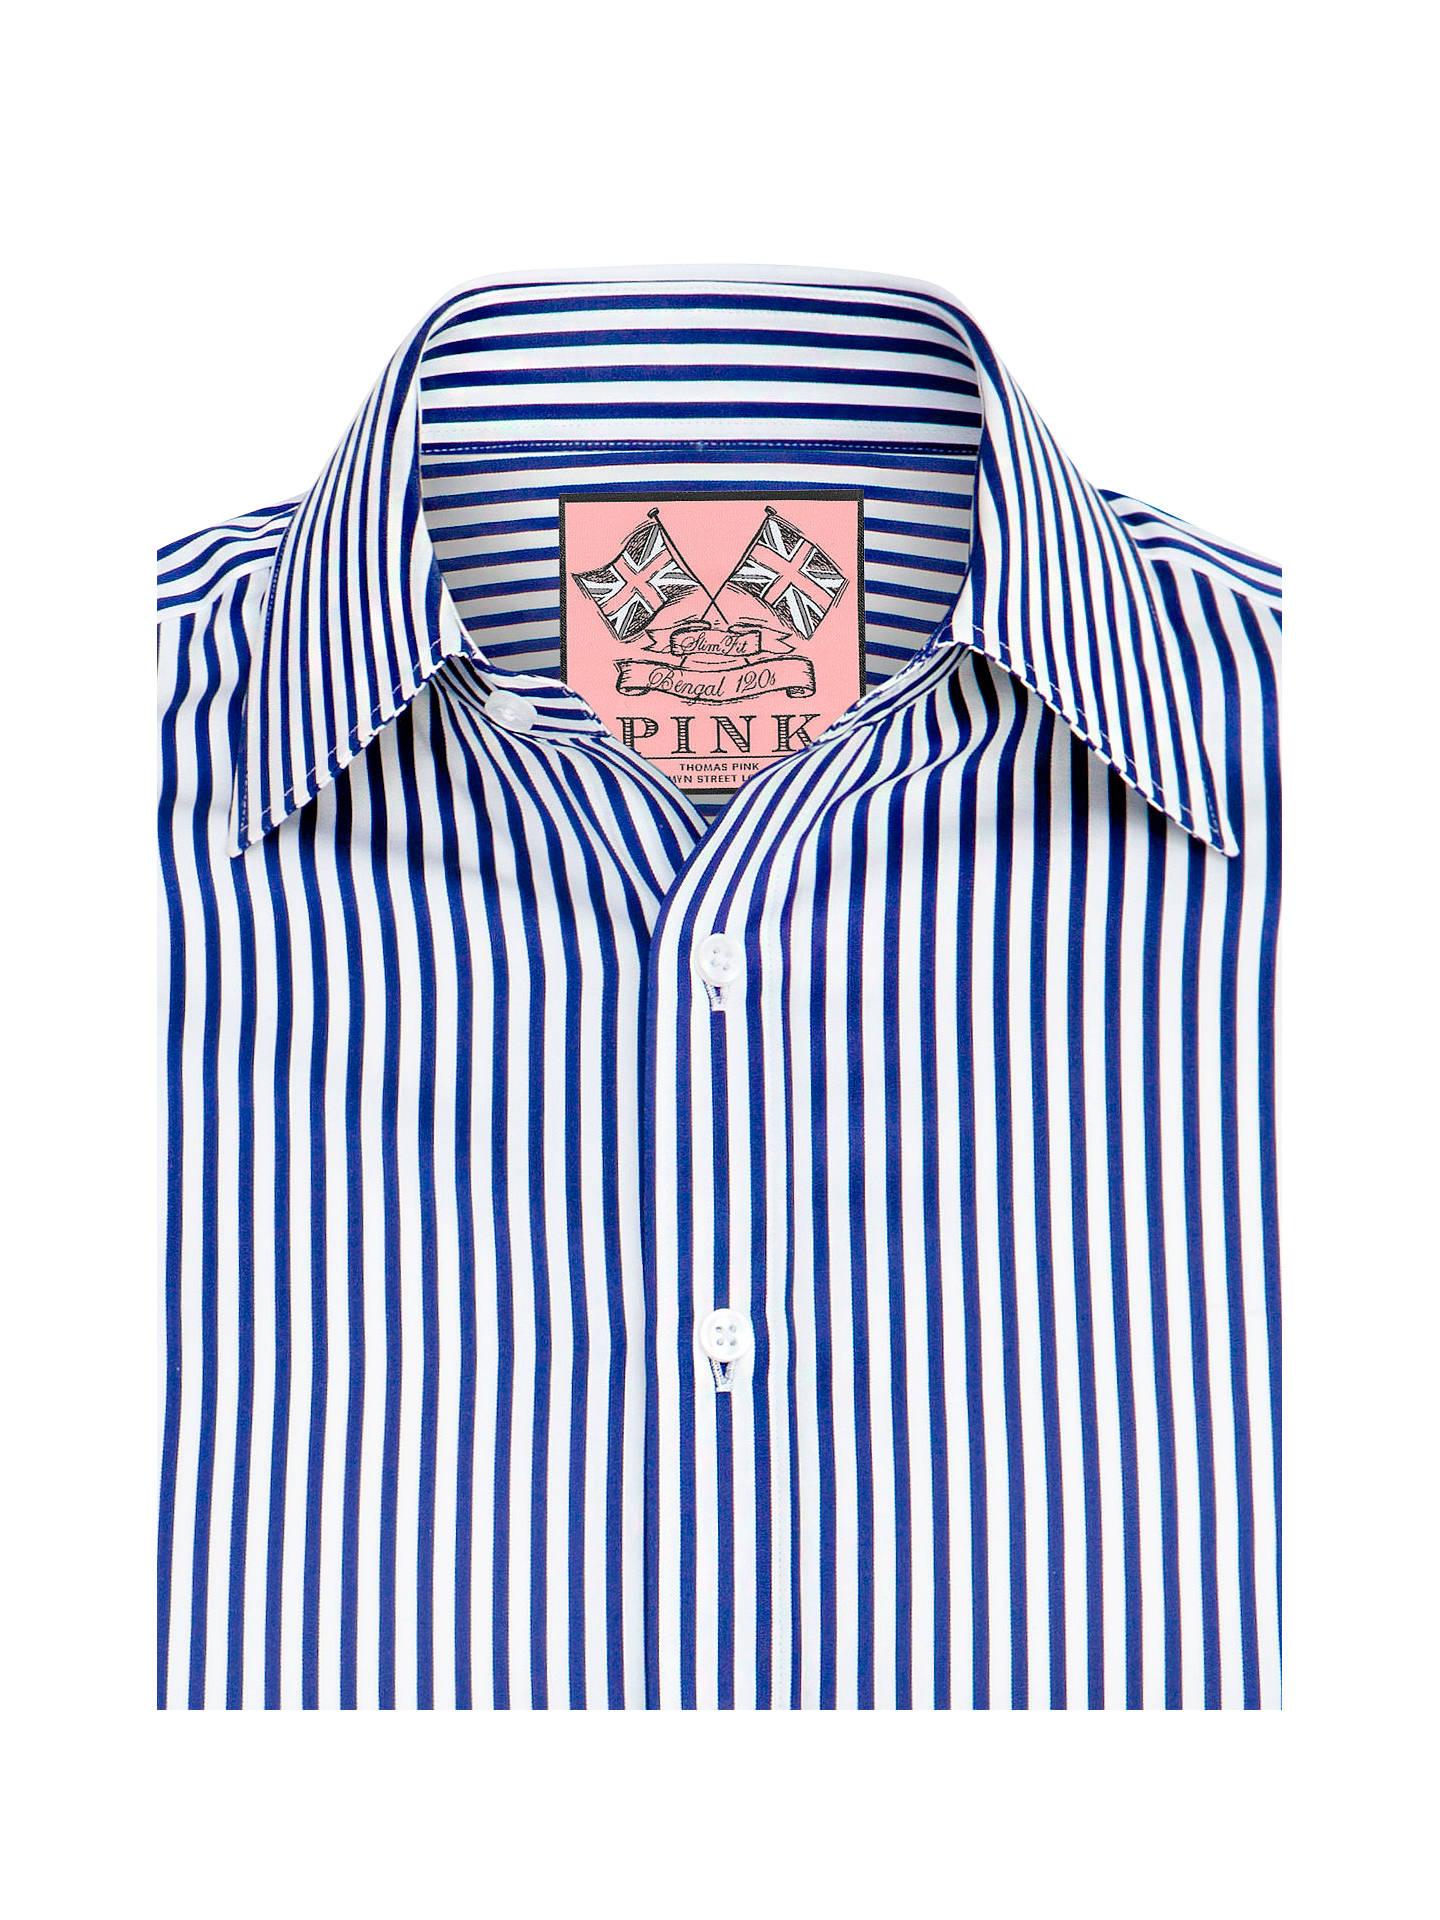 a1c93341 Buy Thomas Pink Algernon Stripe Shirt, Navy/White, 14 Online at johnlewis.